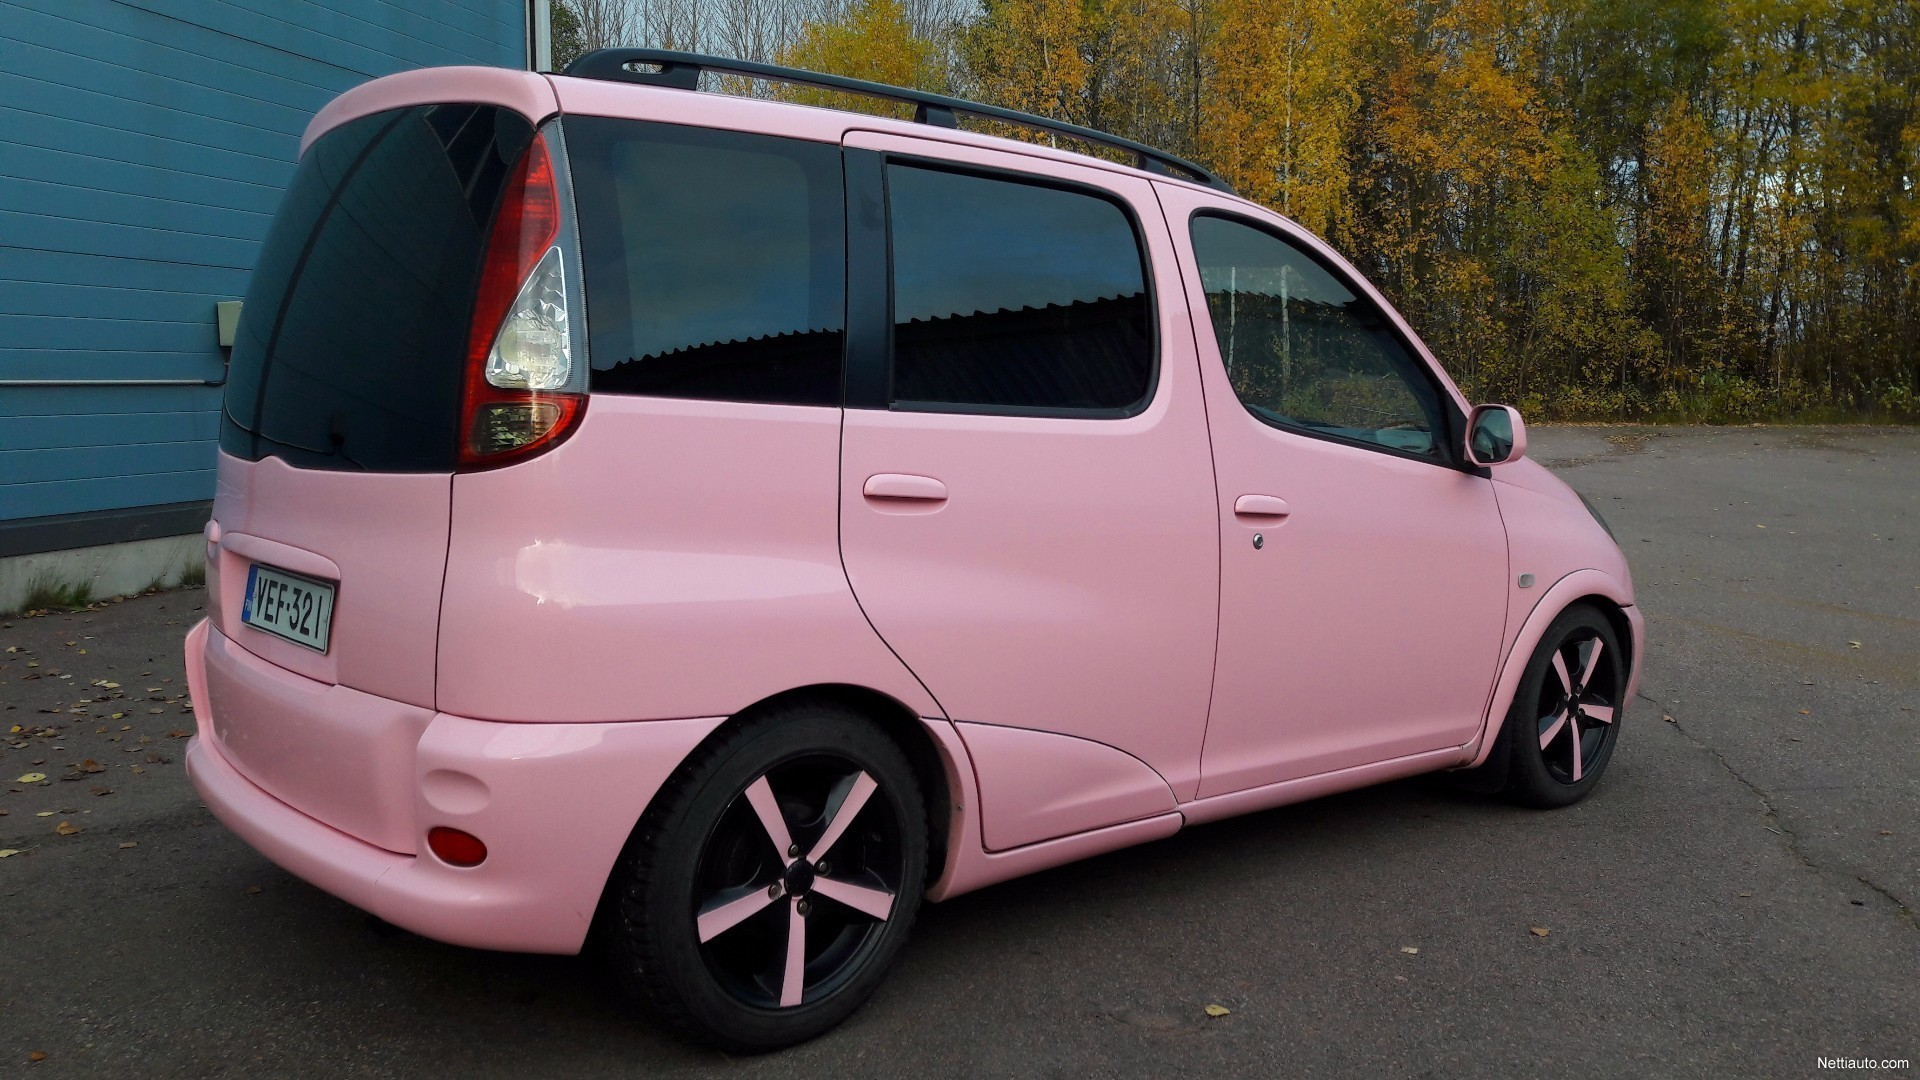 toyota yaris verso verso 1 3 vvt i linea terra mpv 2002 used vehicle nettiauto. Black Bedroom Furniture Sets. Home Design Ideas